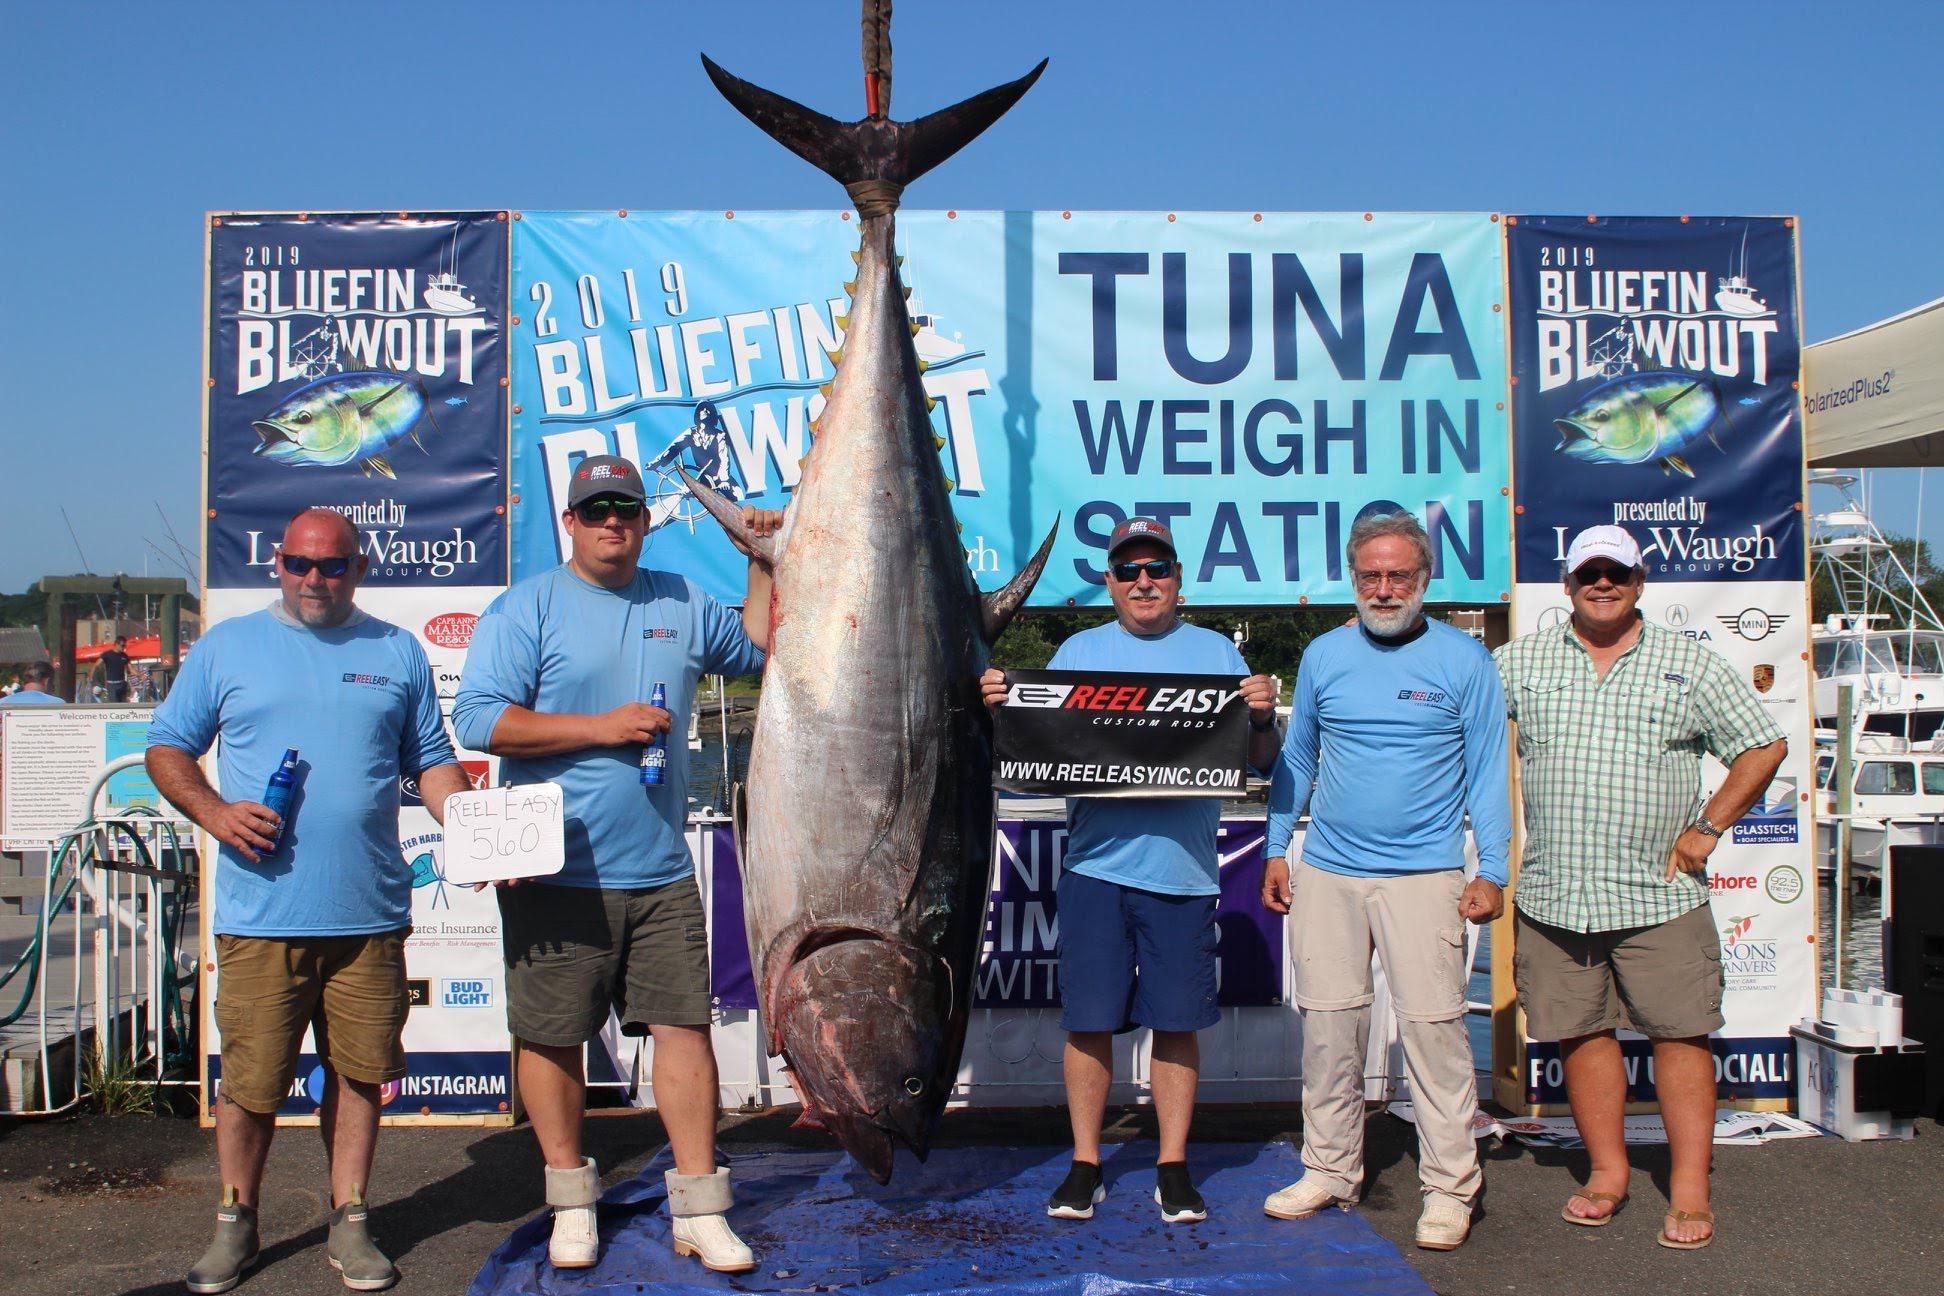 2019 bluefin blowout